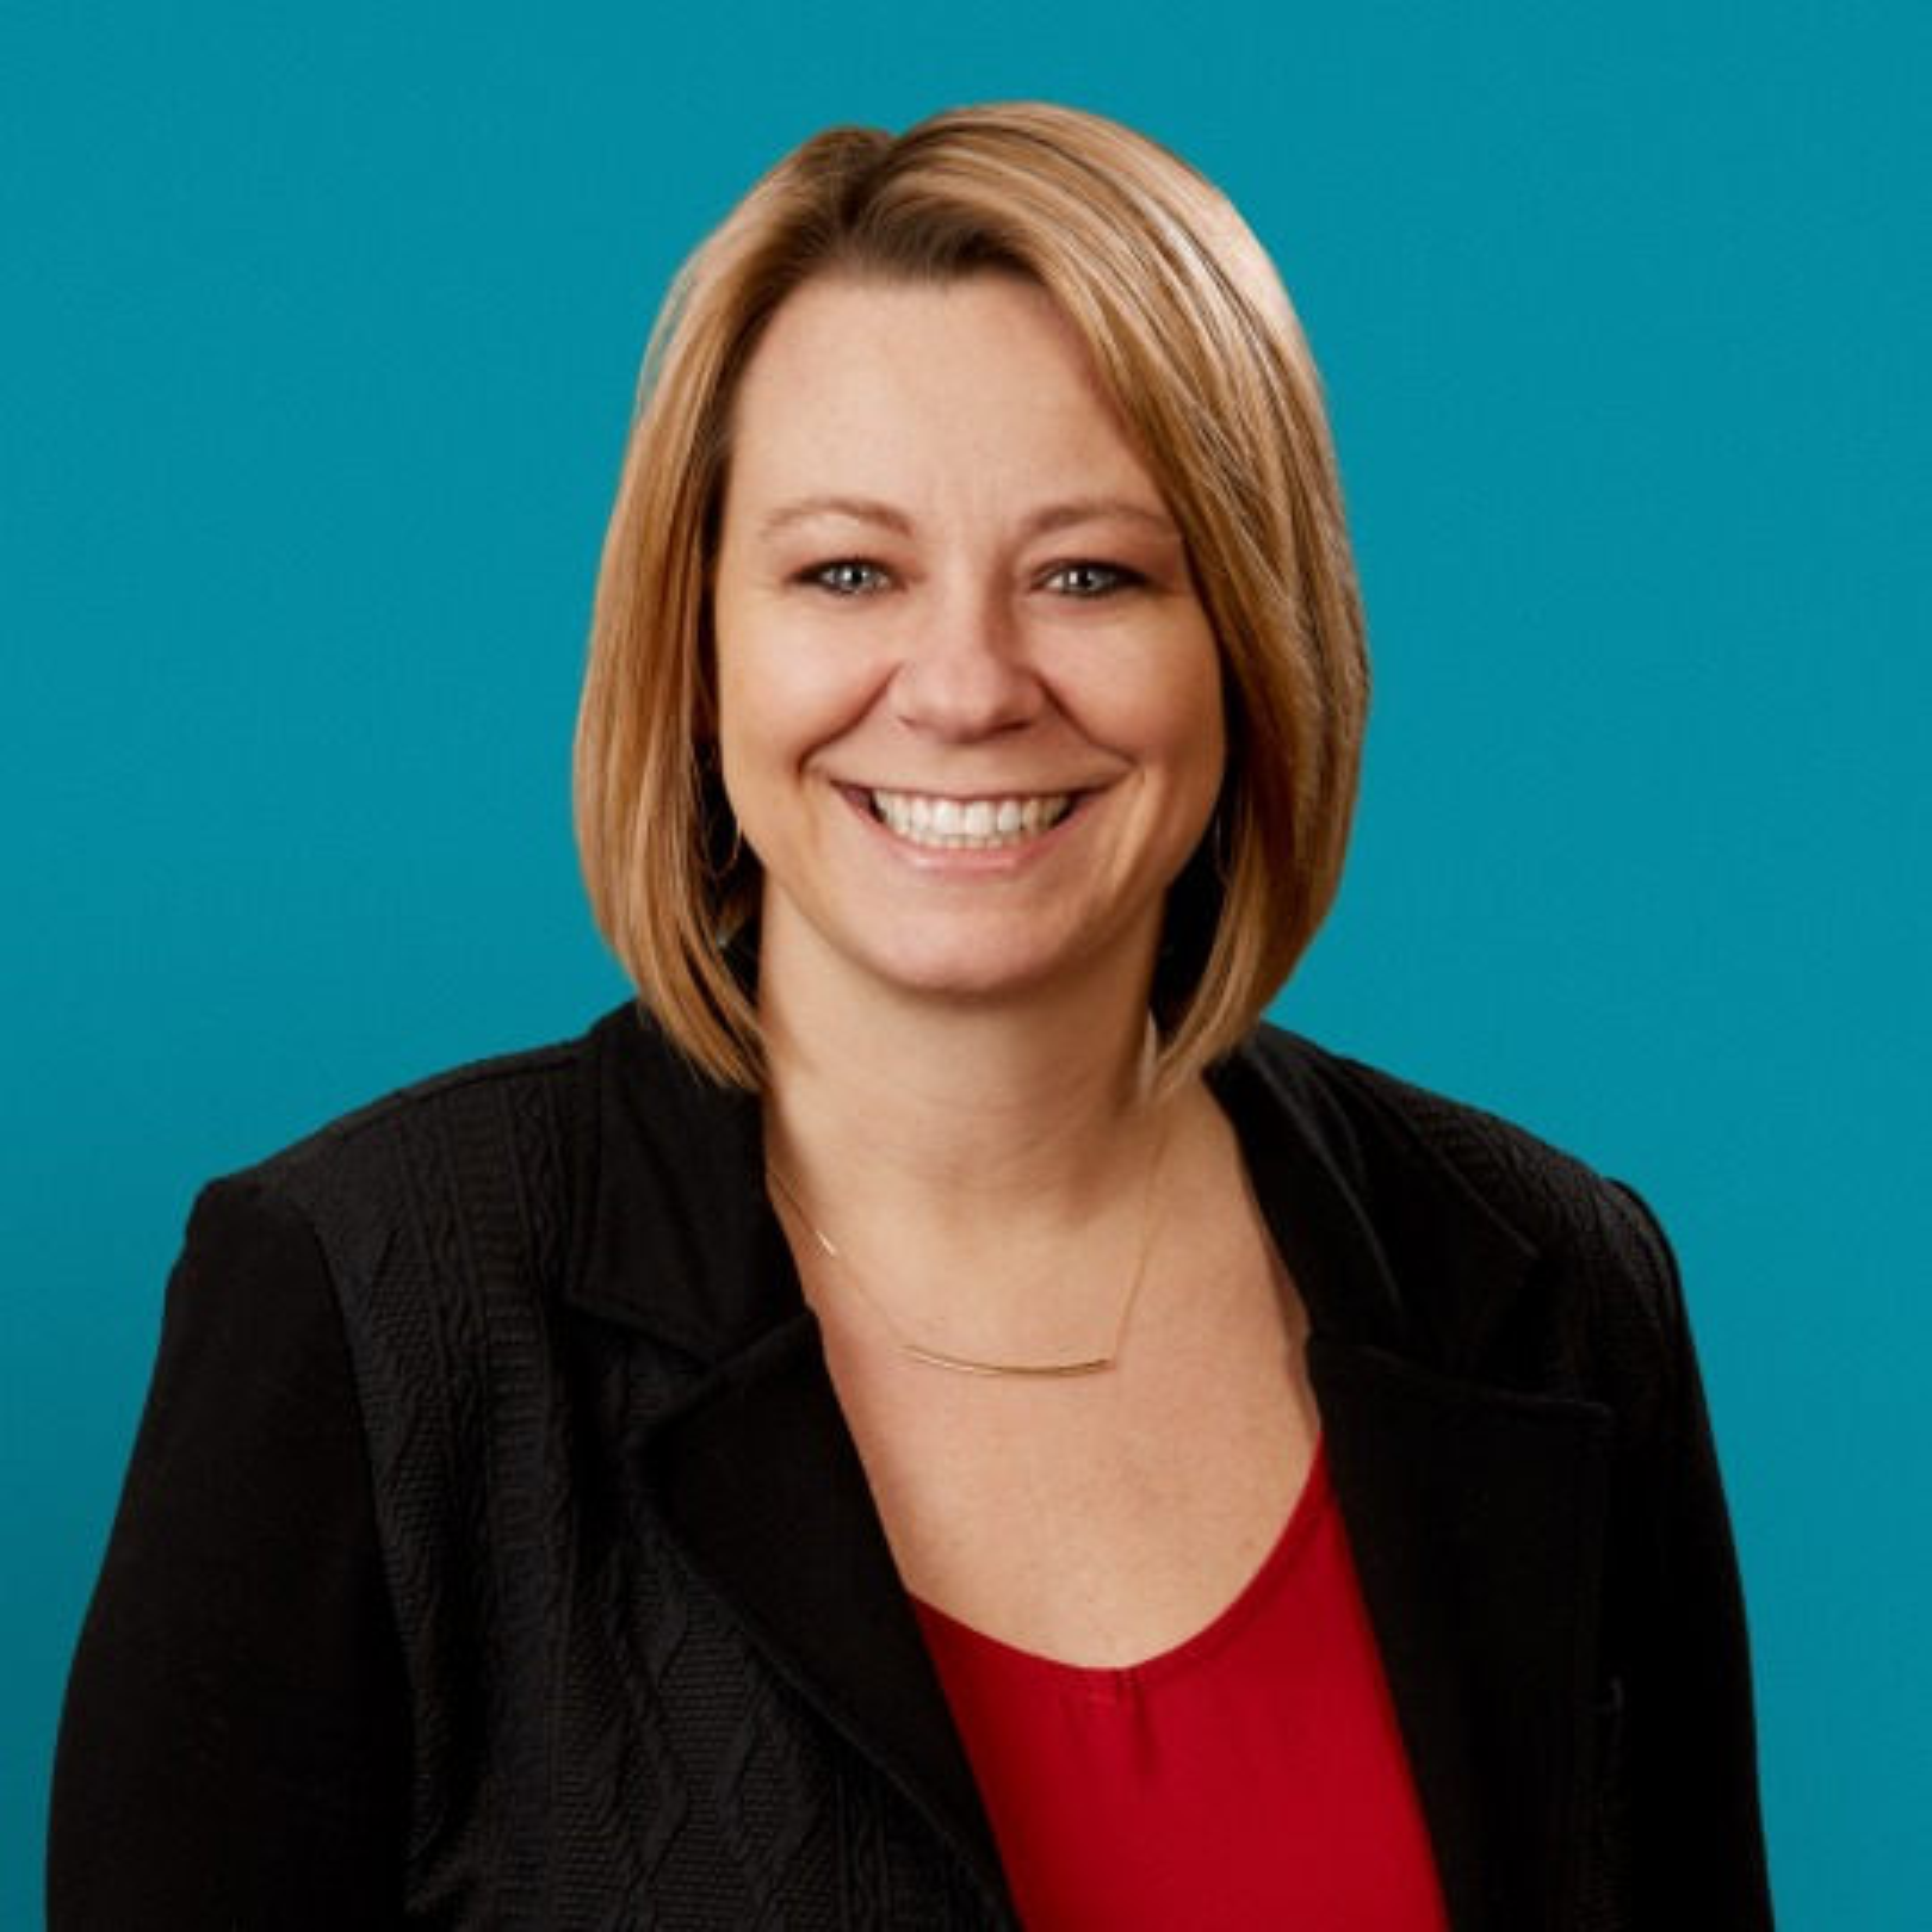 Kelly Walsh smiling